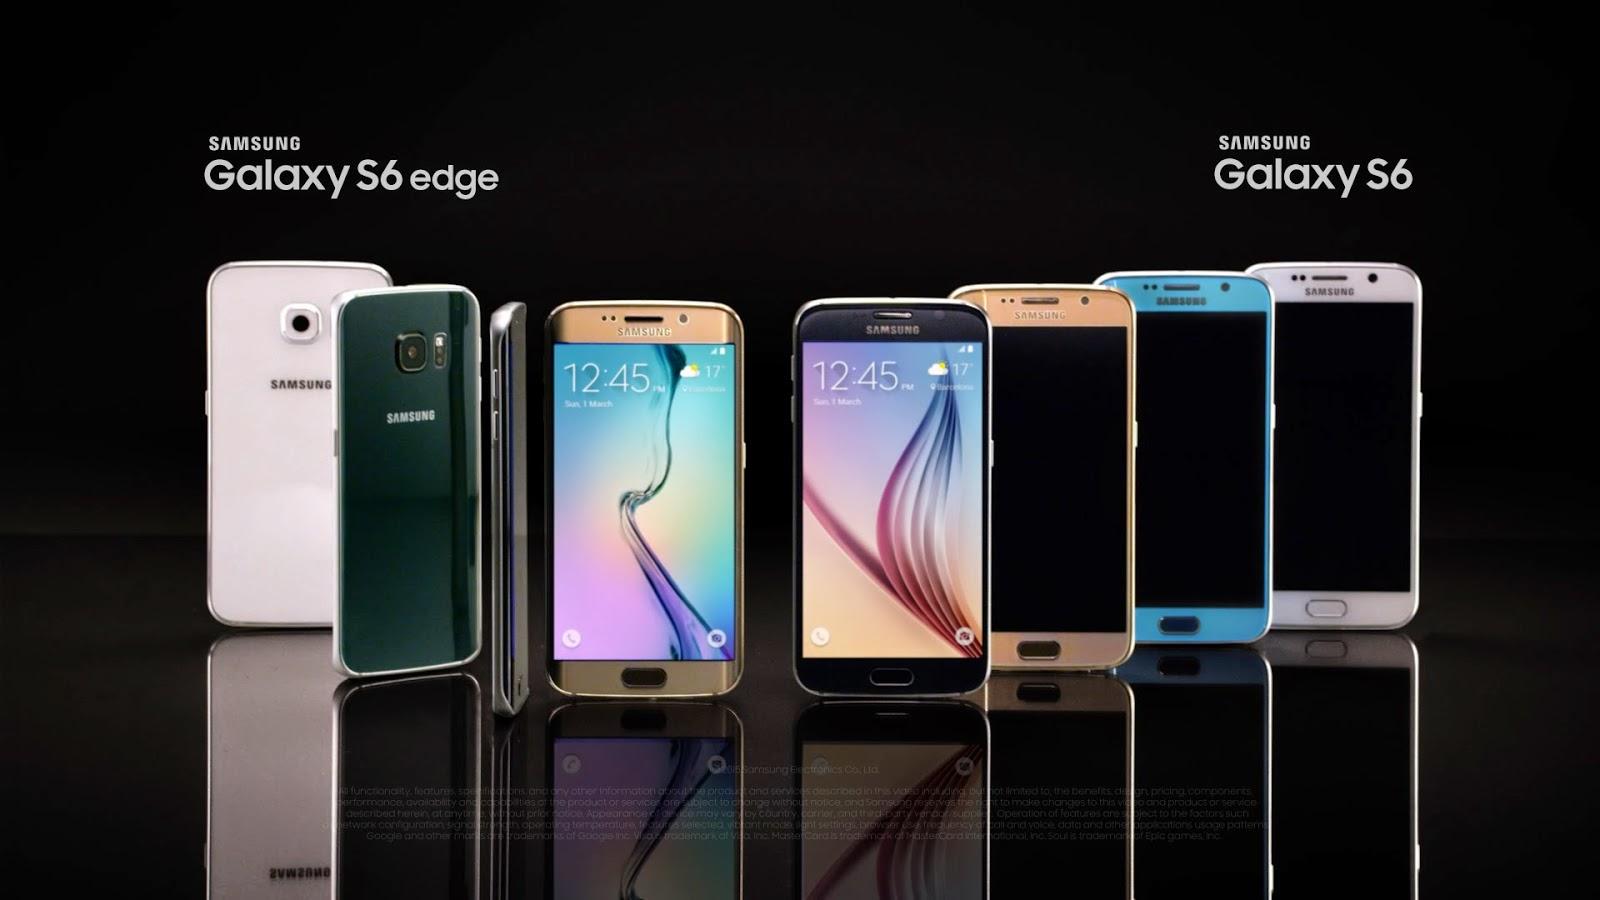 Harga Resmi Samsung Galaxy S6 dan S6 Edge di Indonesia